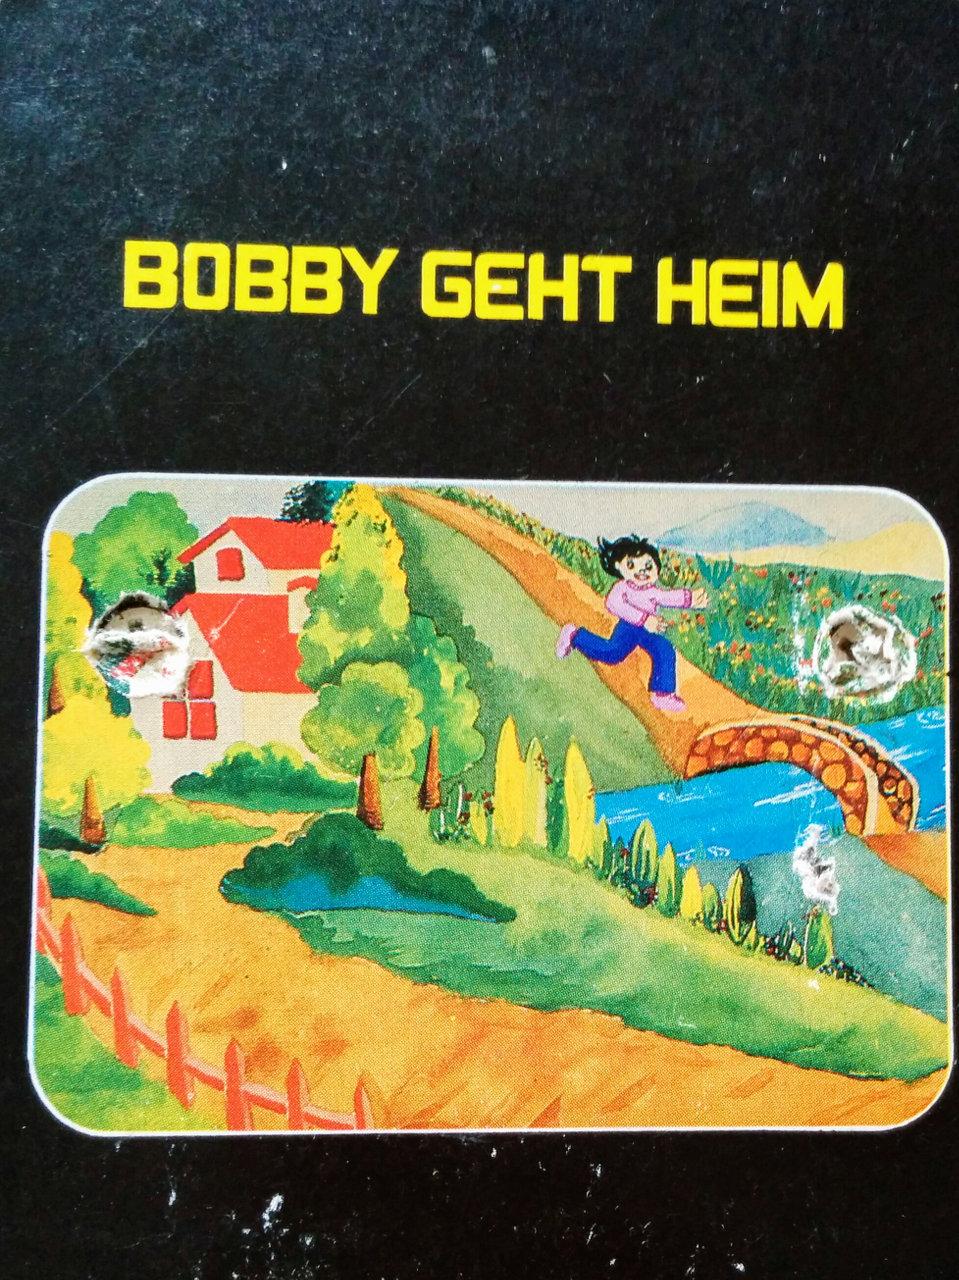 Cover des Spielmoduls, Bobby geht heim, Quelle, 1982. (Bild: Florian Weber)